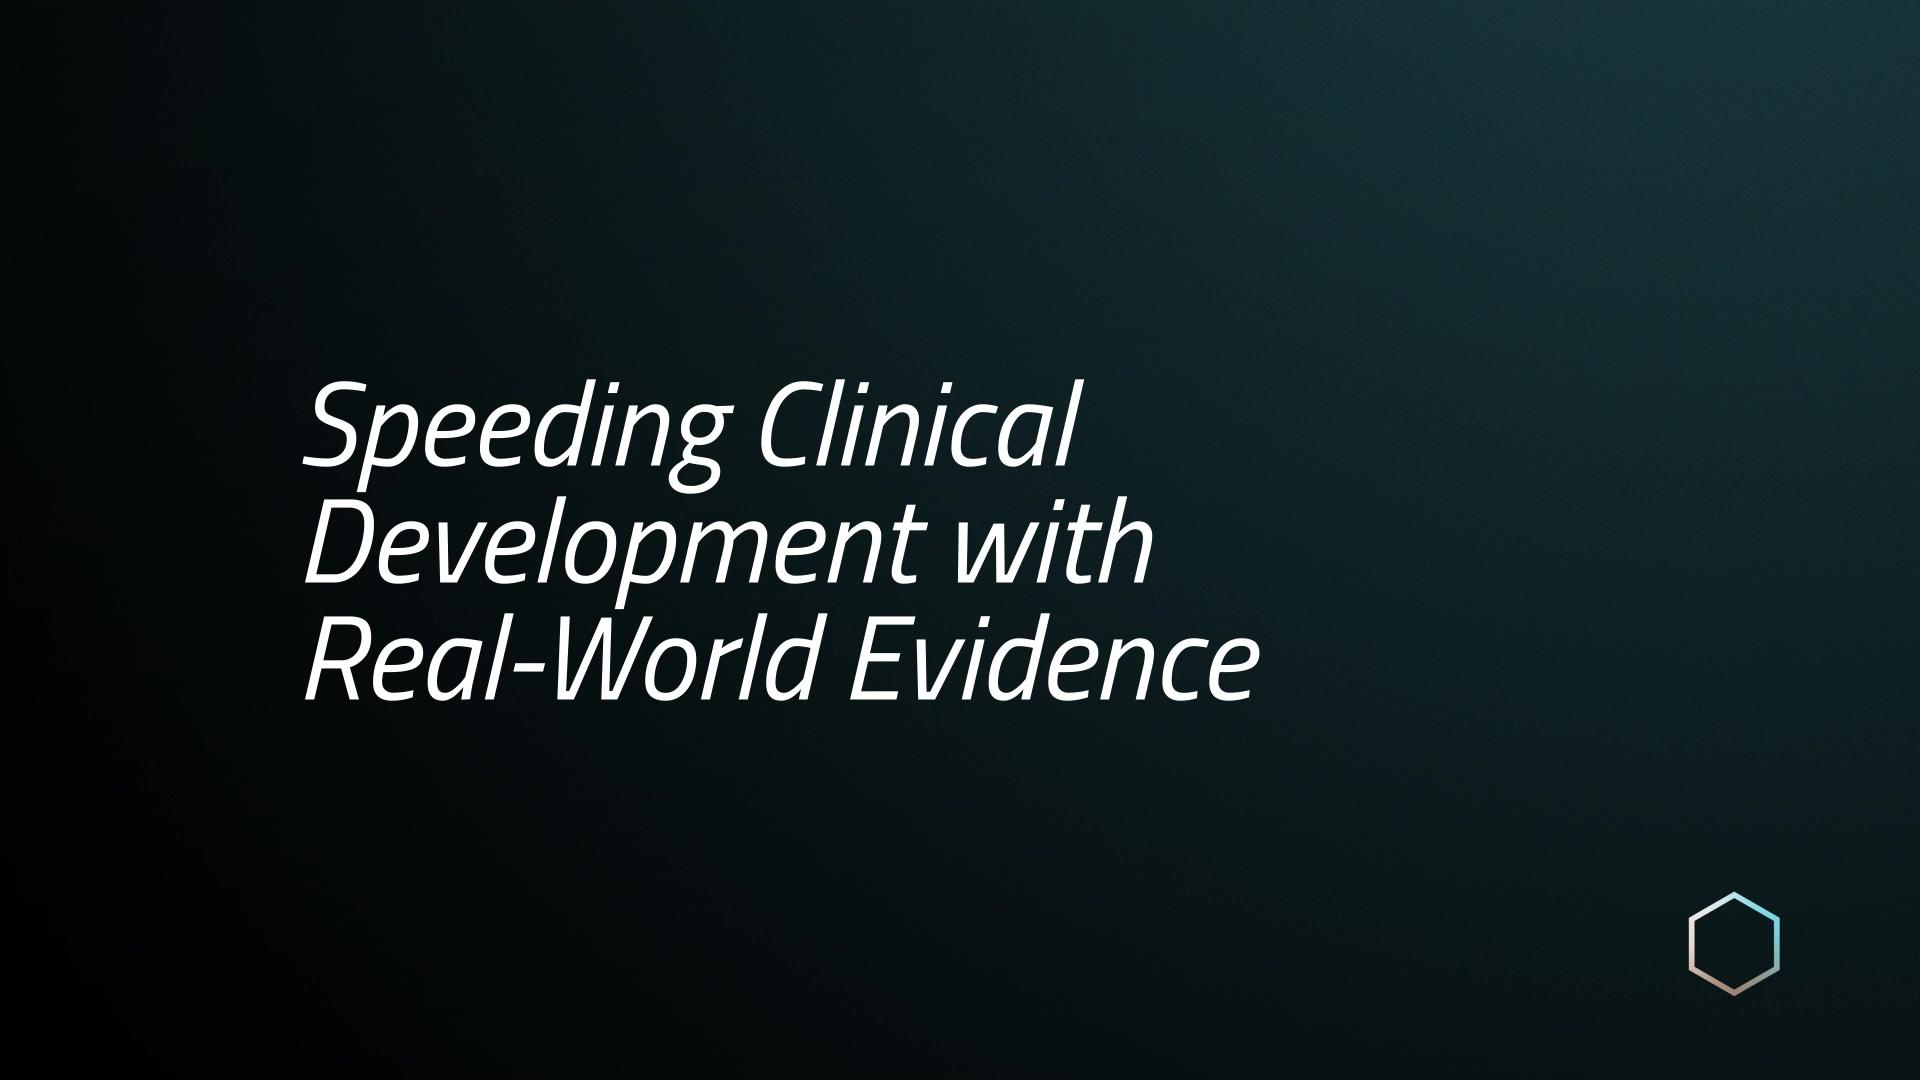 Komodo_ Dr. Aswin Chandrakantan -  Speeding Clinical Development with Real-World Evidence